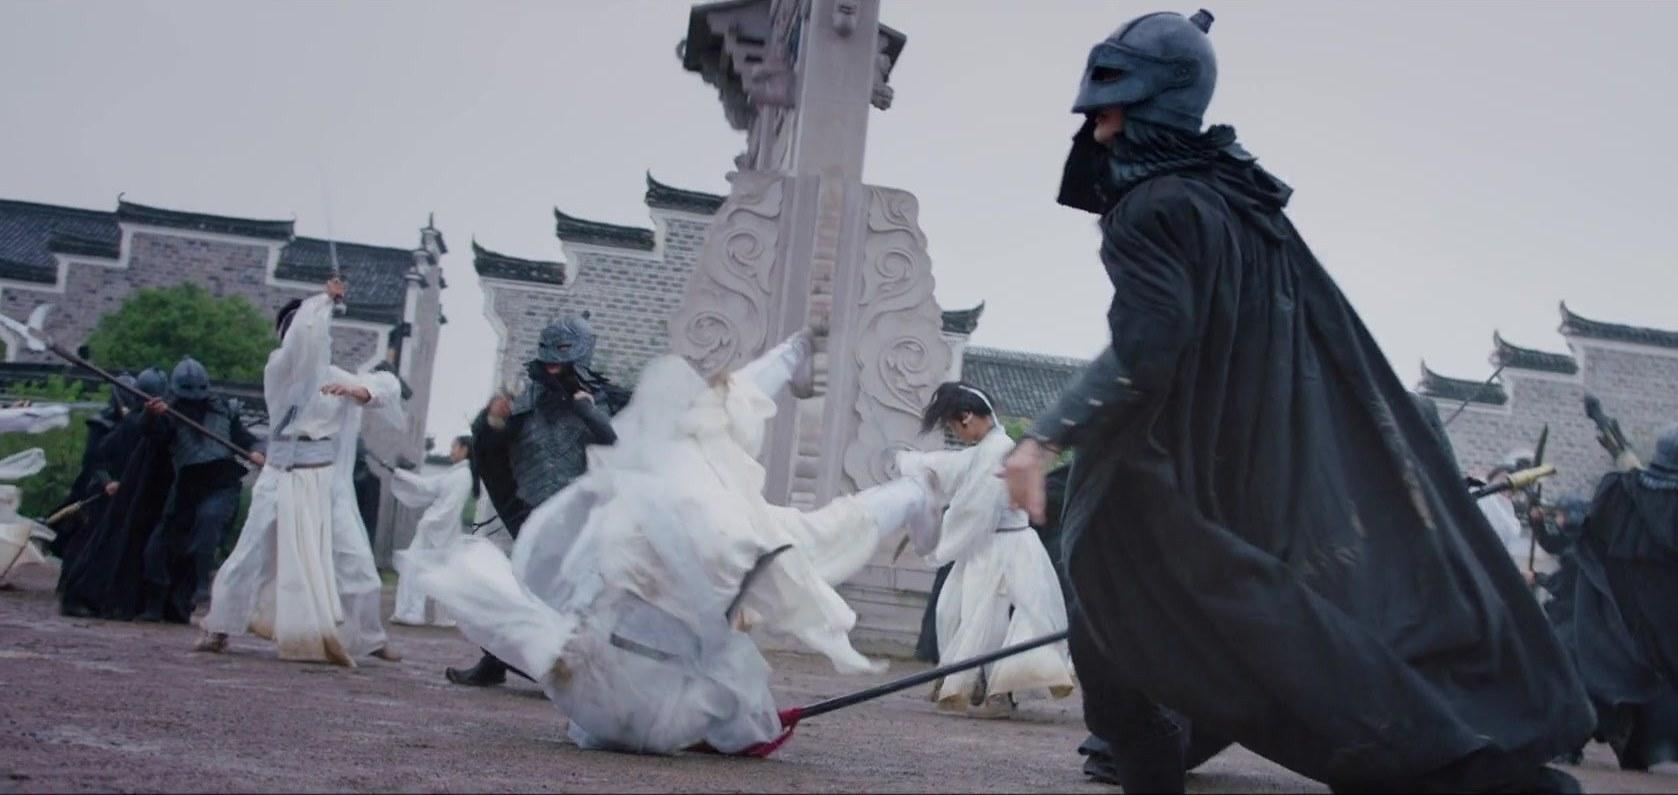 Opening battle scene in The Legend of Zu (2018)